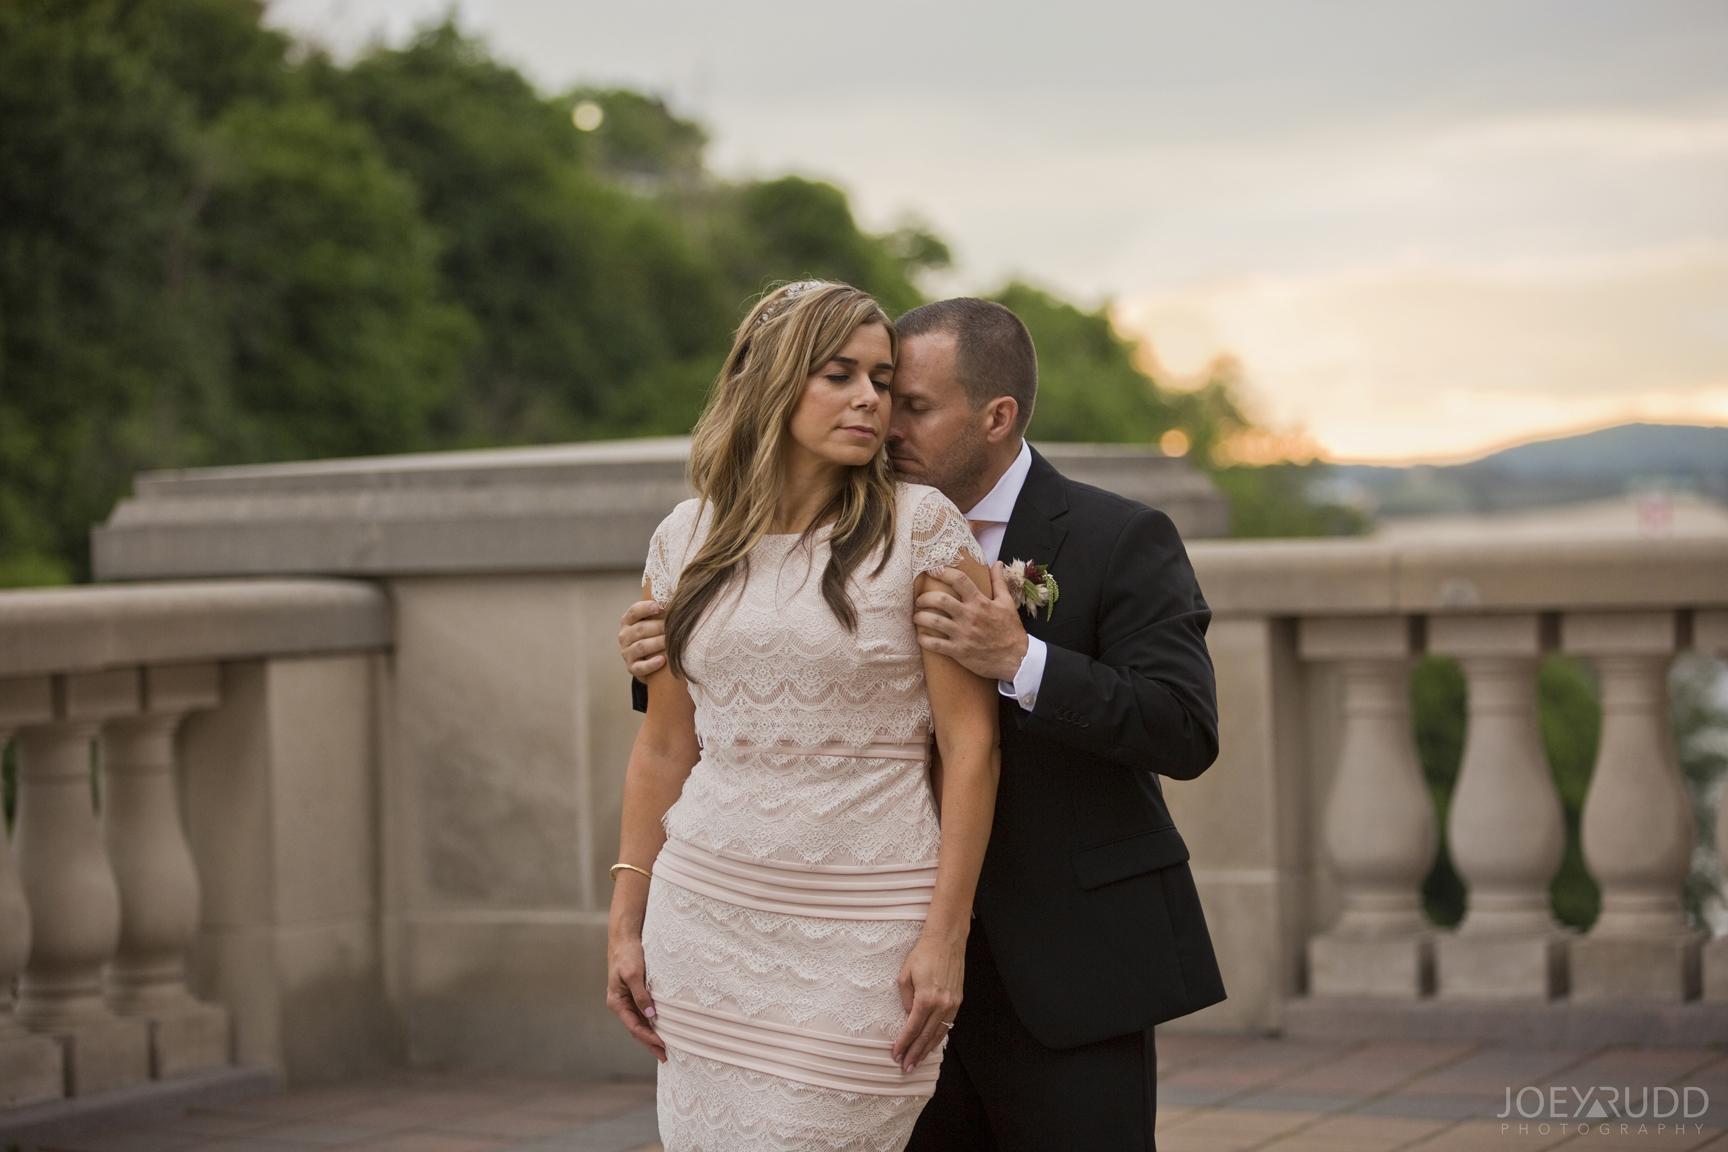 Elopement Wedding by Ottawa Wedding Photographer Joey Rudd Photography Majors Hill Sunset Chateau Laurier